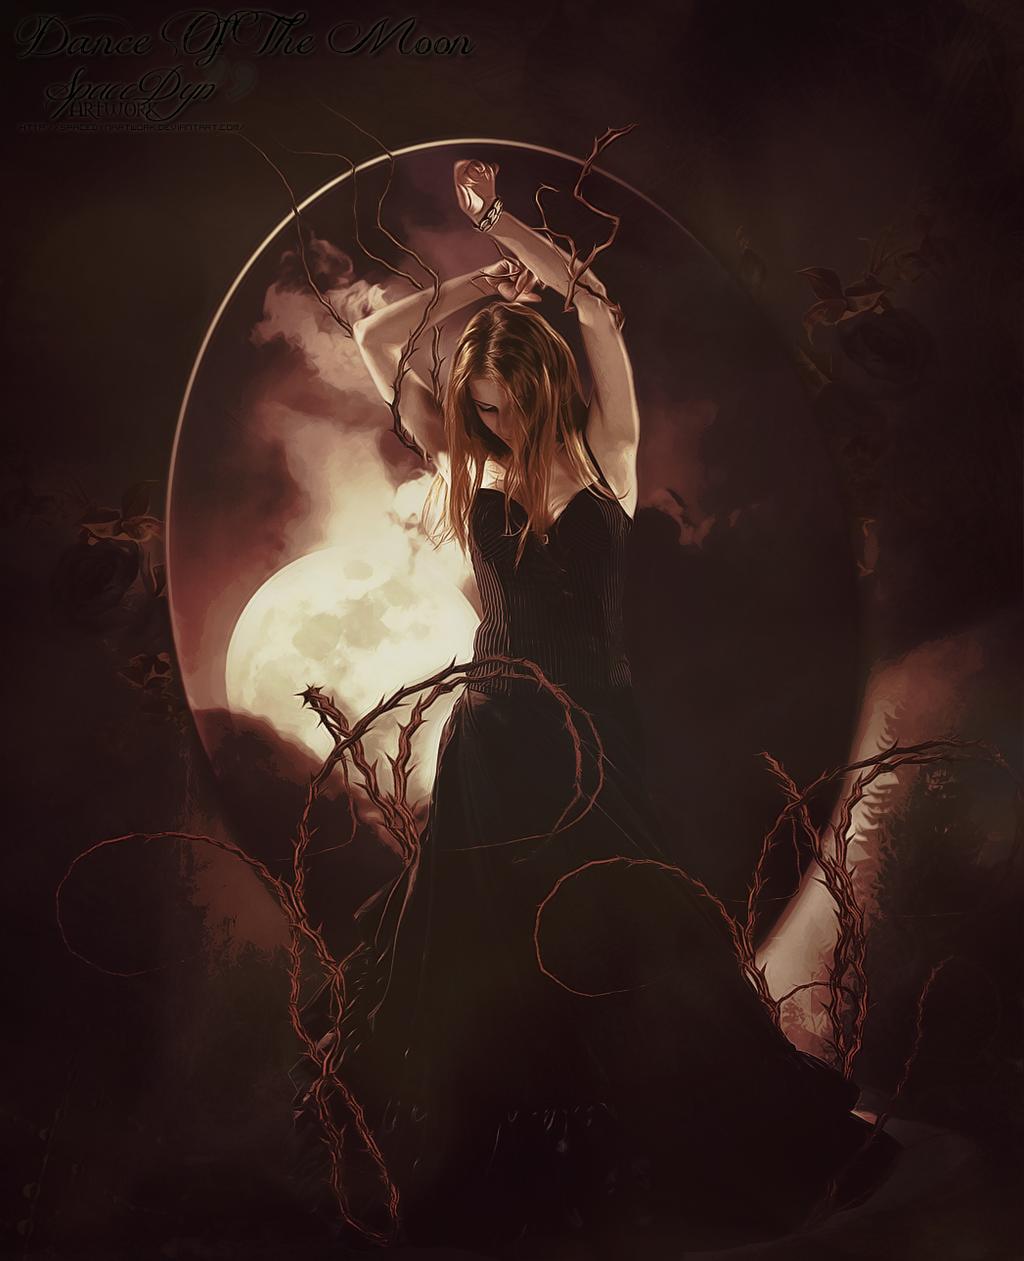 Dance Of The Moon by Dyn